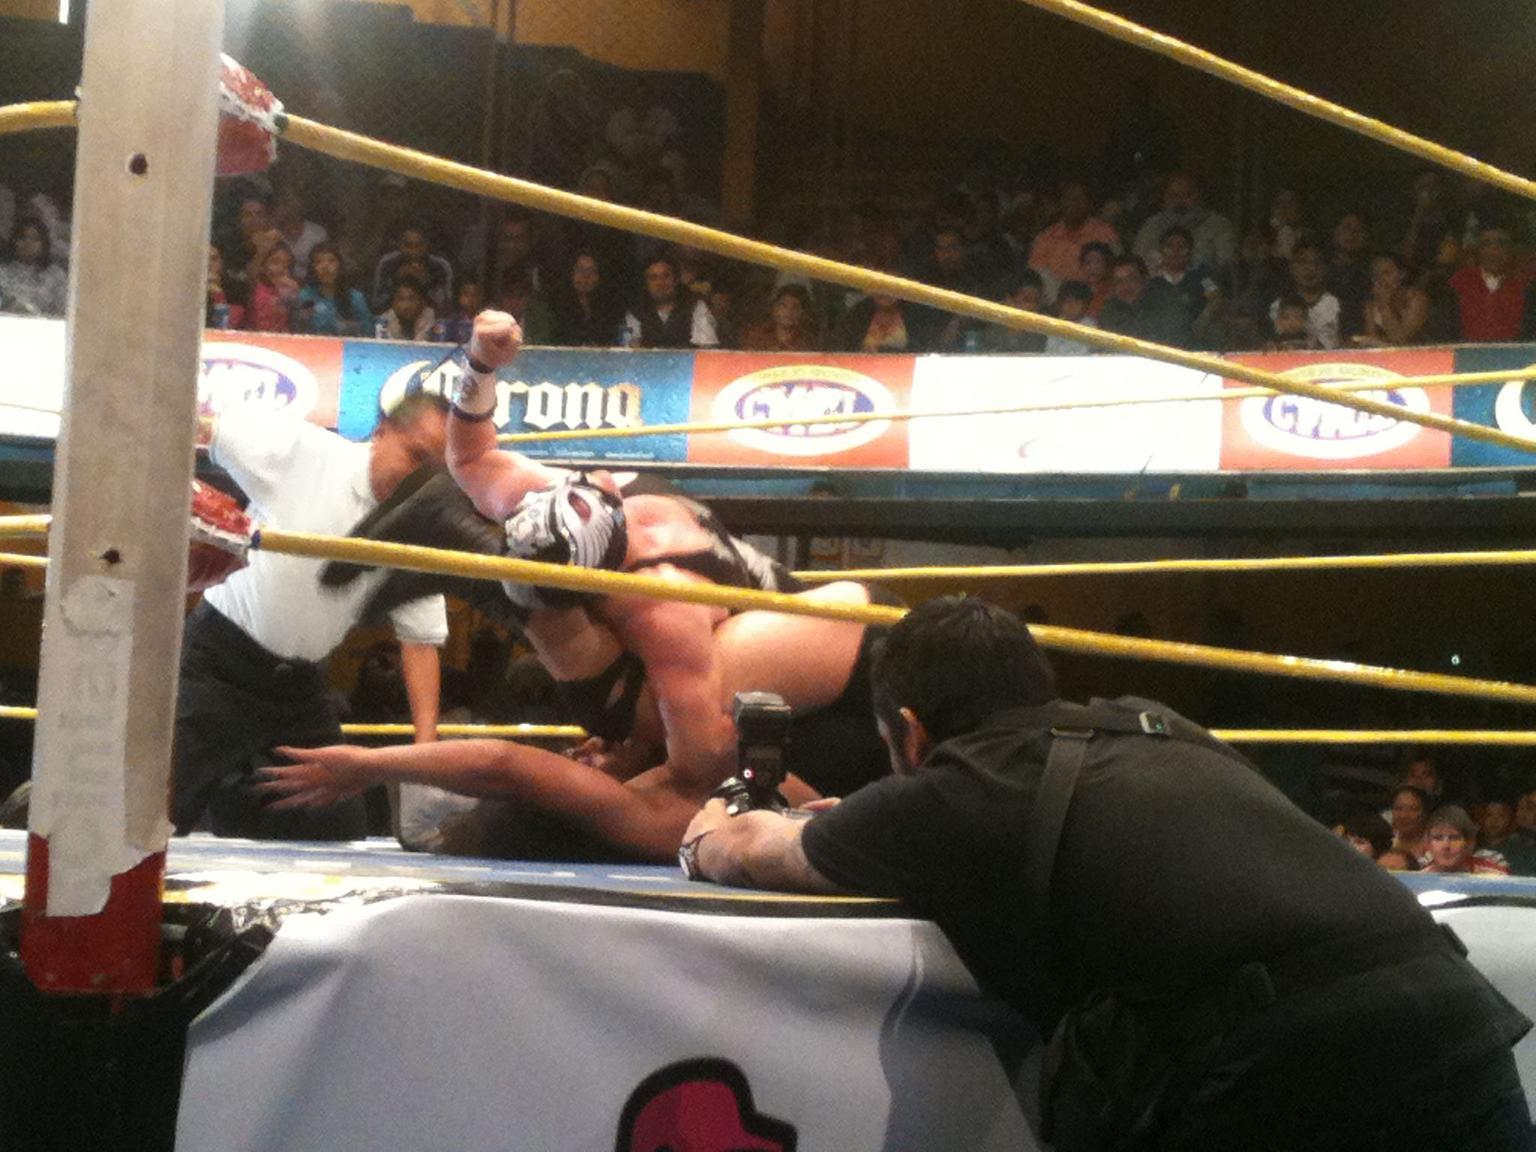 MAIS FOTOS, Mexican Wrestling: Experience Lucha Libre in Mexico City